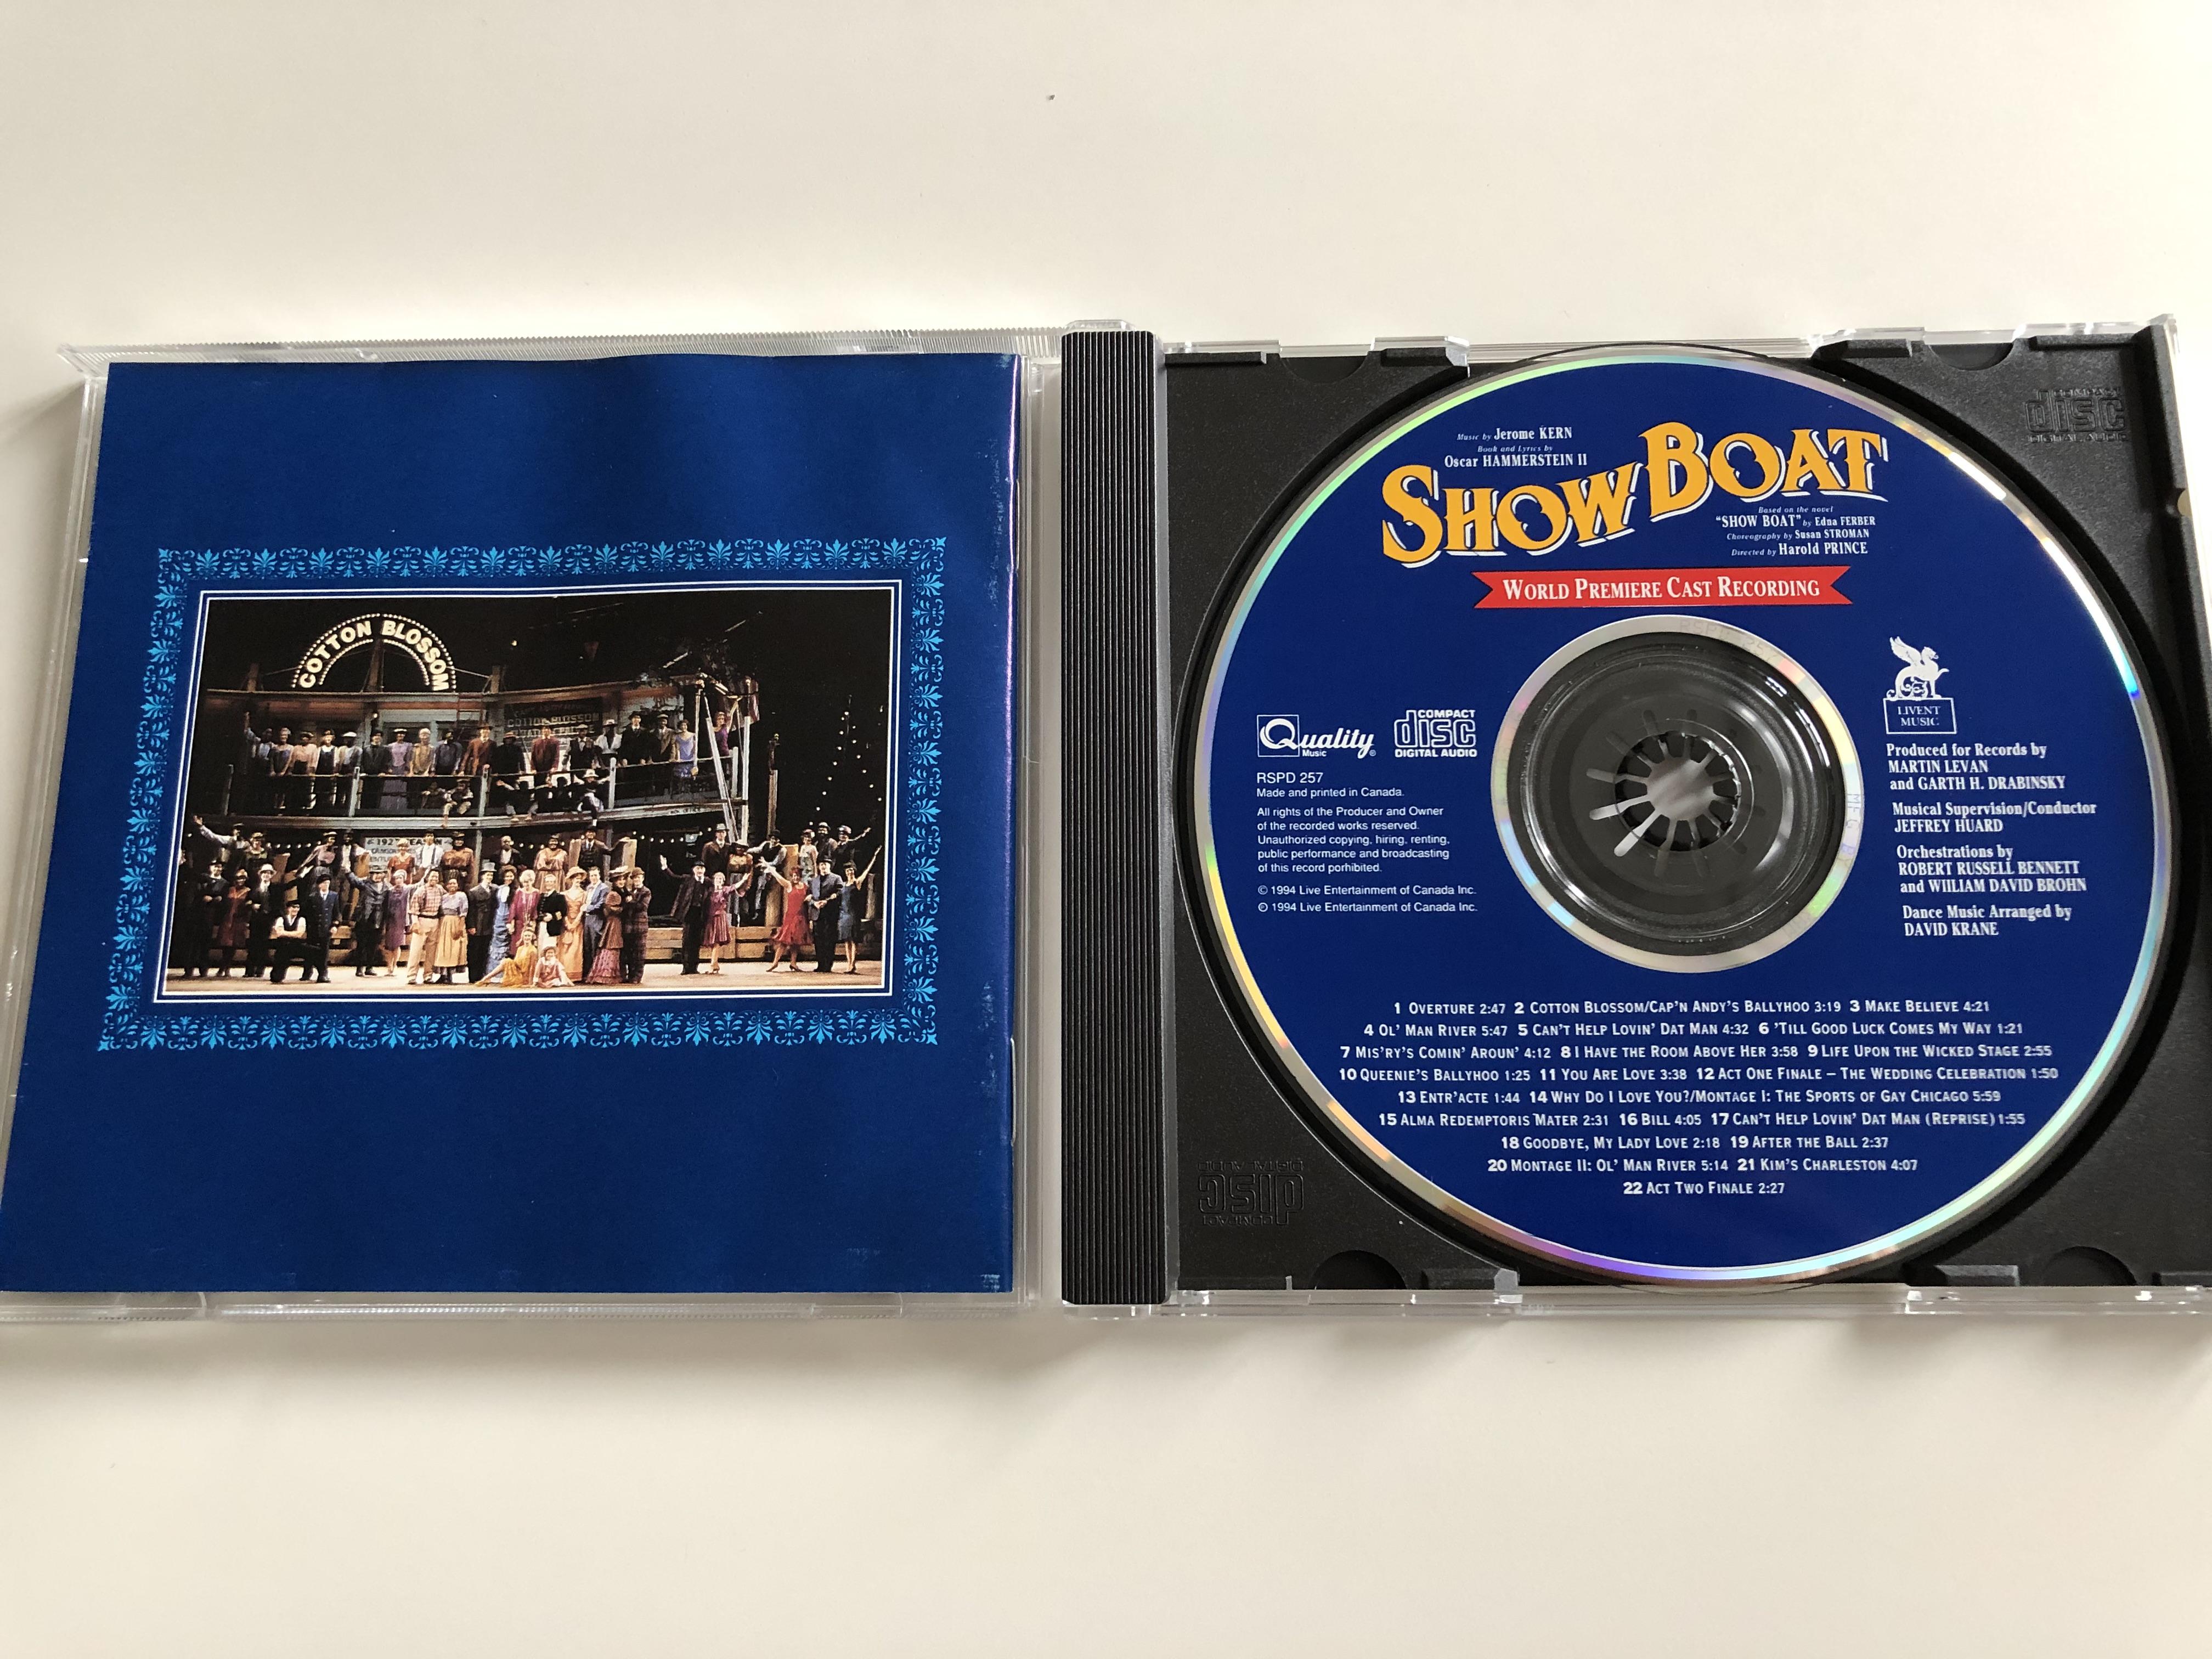 show-boat-jerome-kern-oscar-hammerstein-ii-edna-ferber-susan-stroman-harold-prince-quality-music-audio-cd-1994-rspd-257-2-.jpg